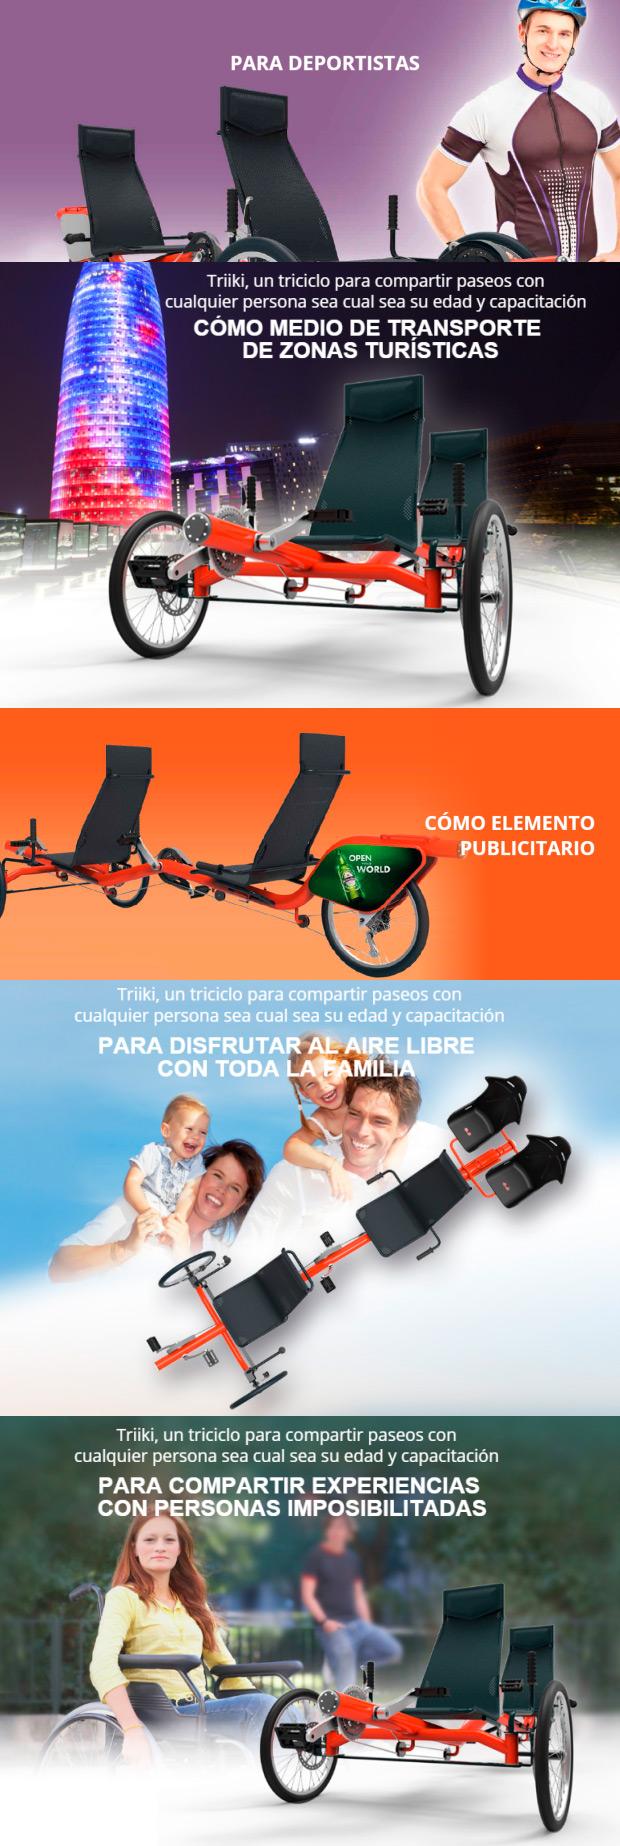 Triiki, un tándem de tres ruedas para disfrutar de la bicicleta en familia